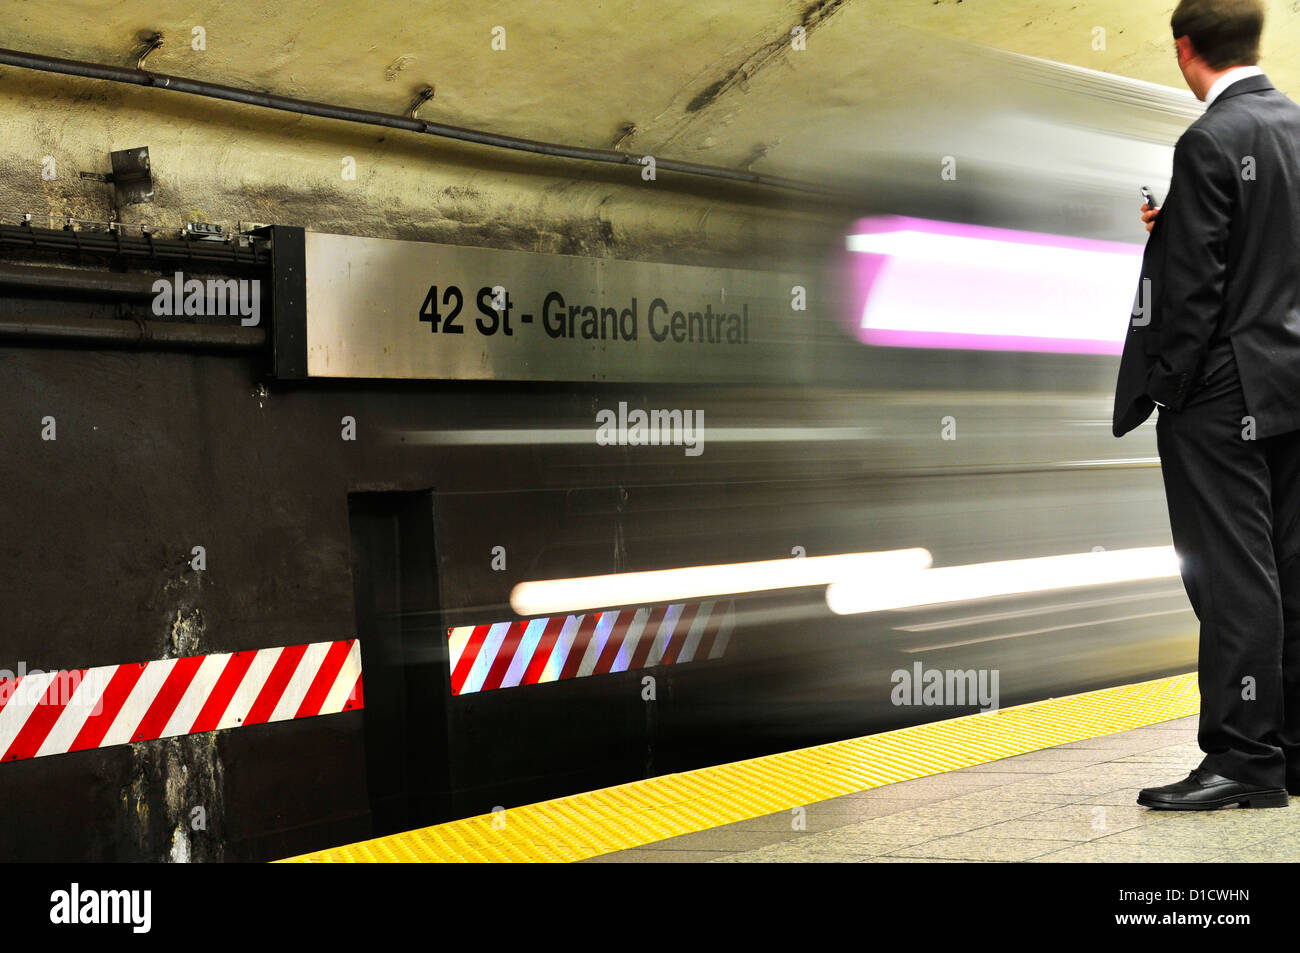 42 nd Street, Grand Central Terminal, Numer 7 Subway, Manhattan, New York City, USA - Stock Image